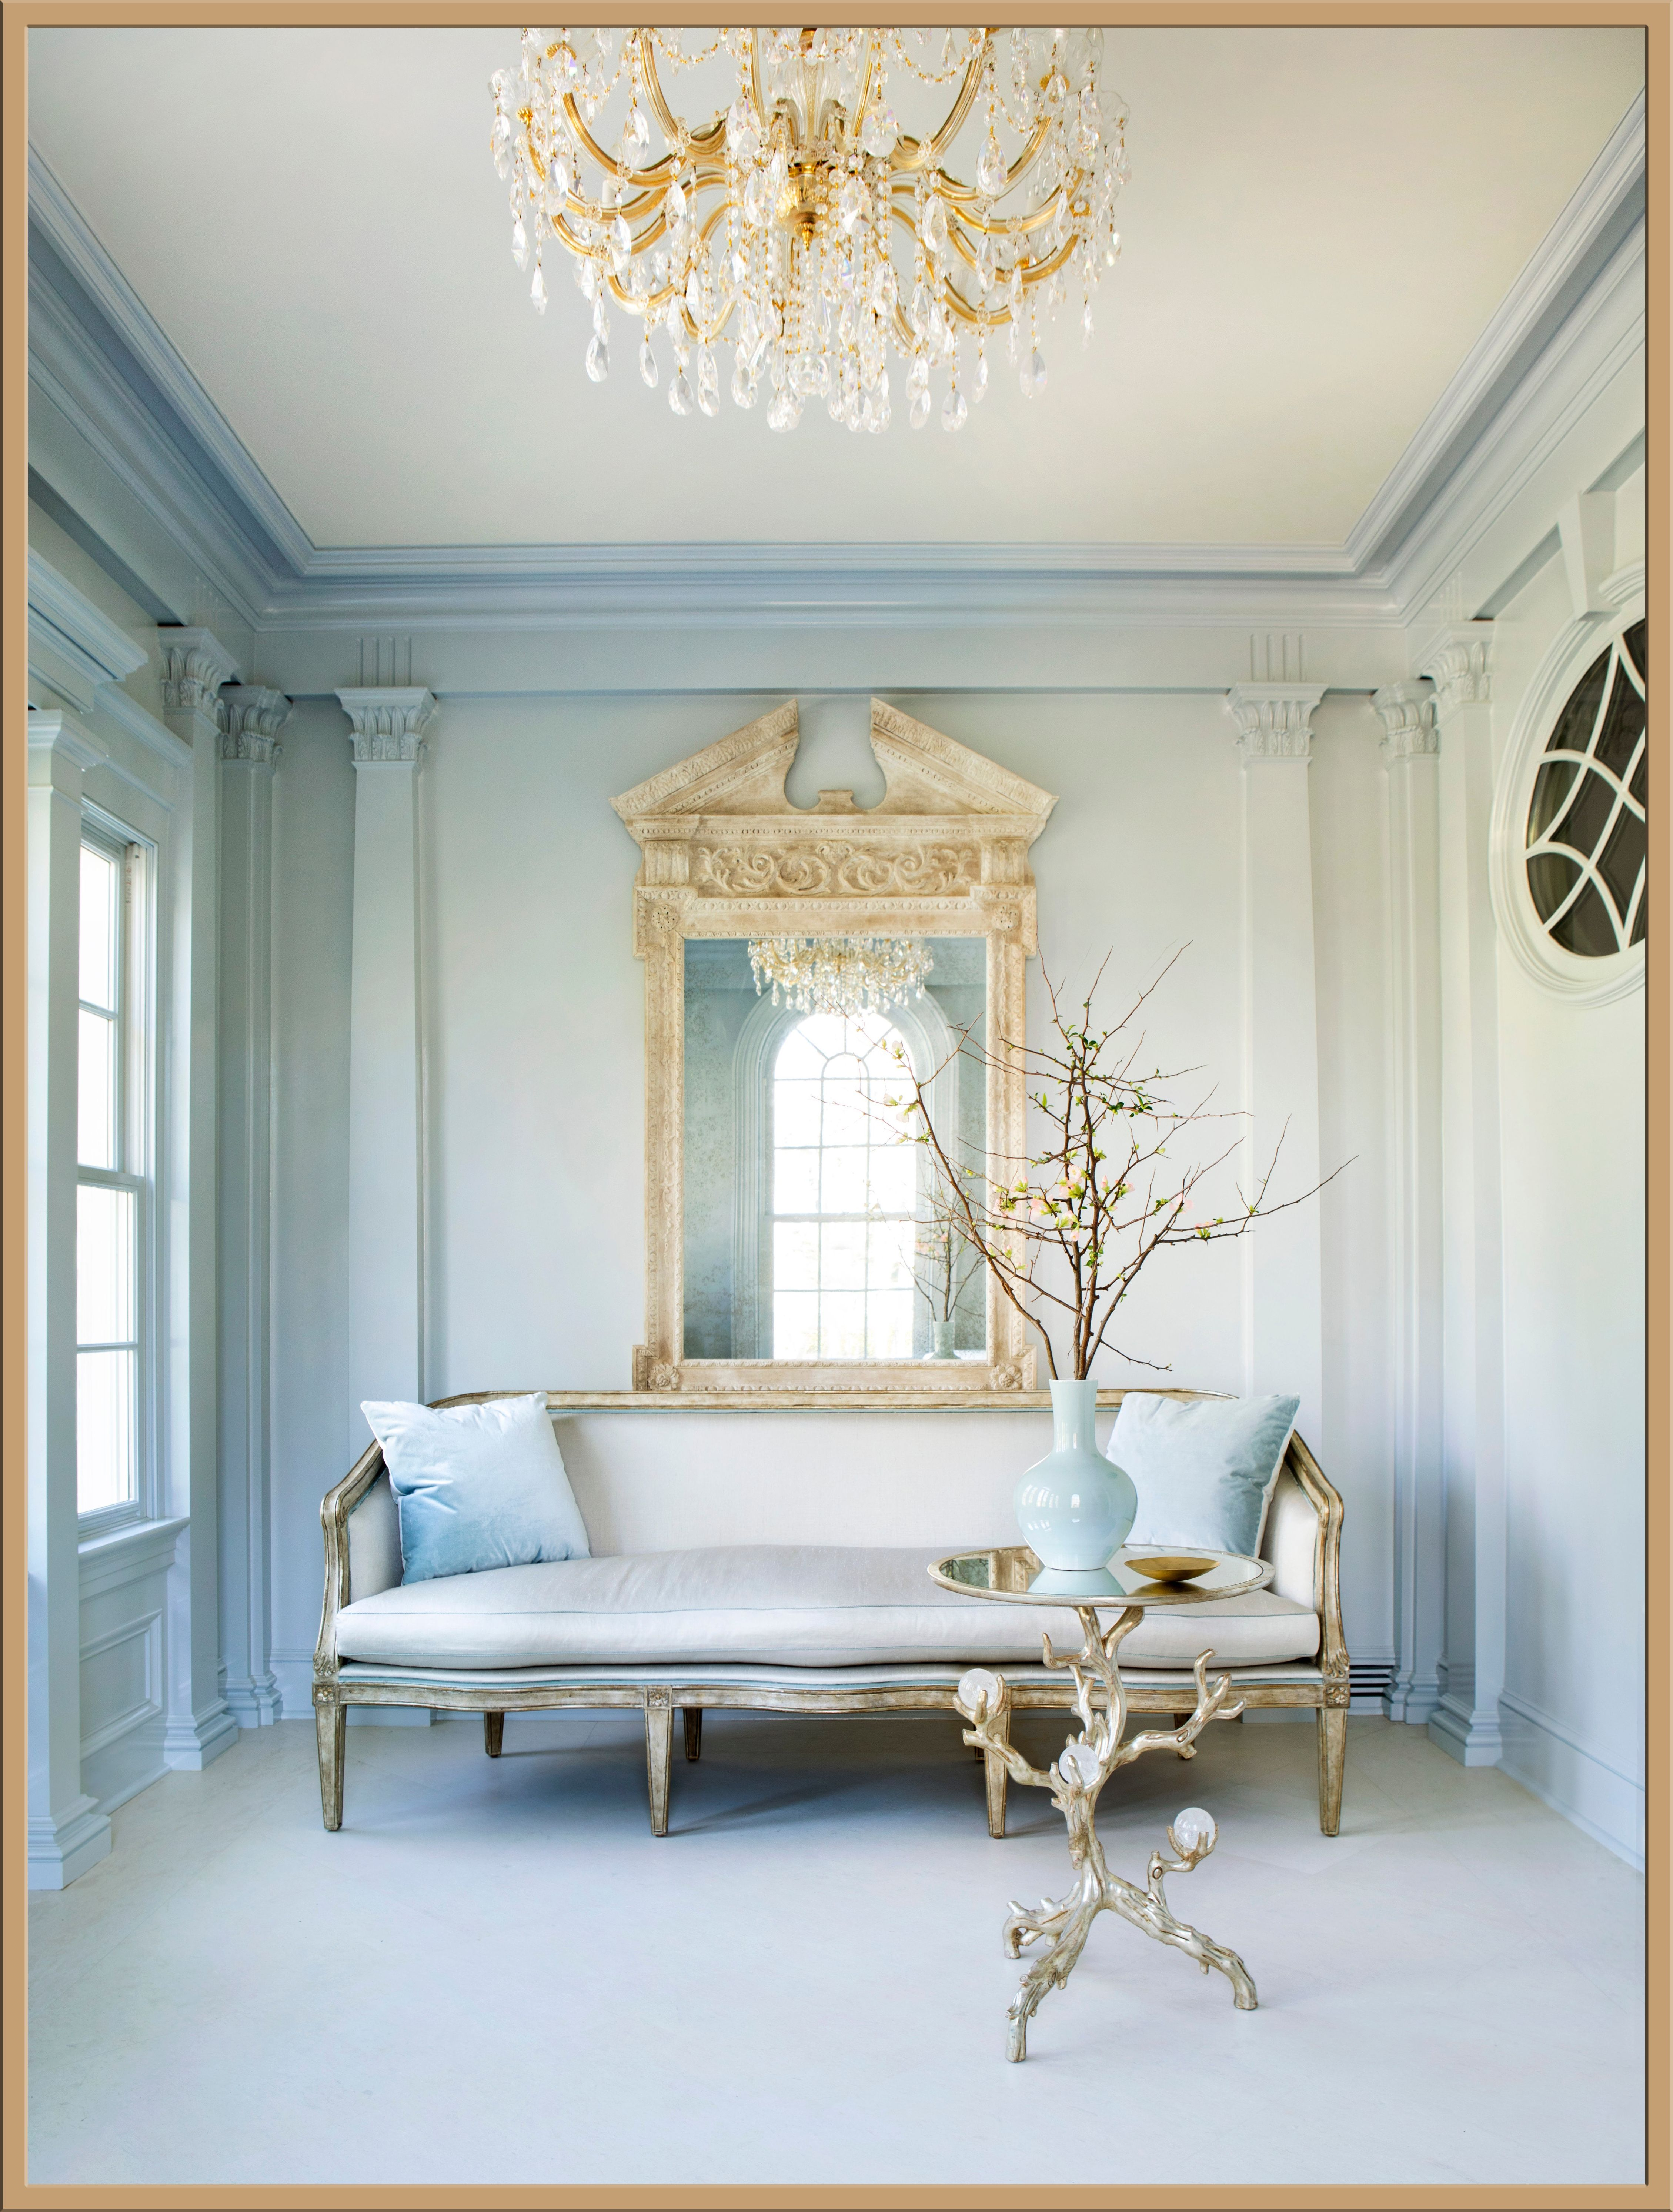 10 Alternatives To Interior Design